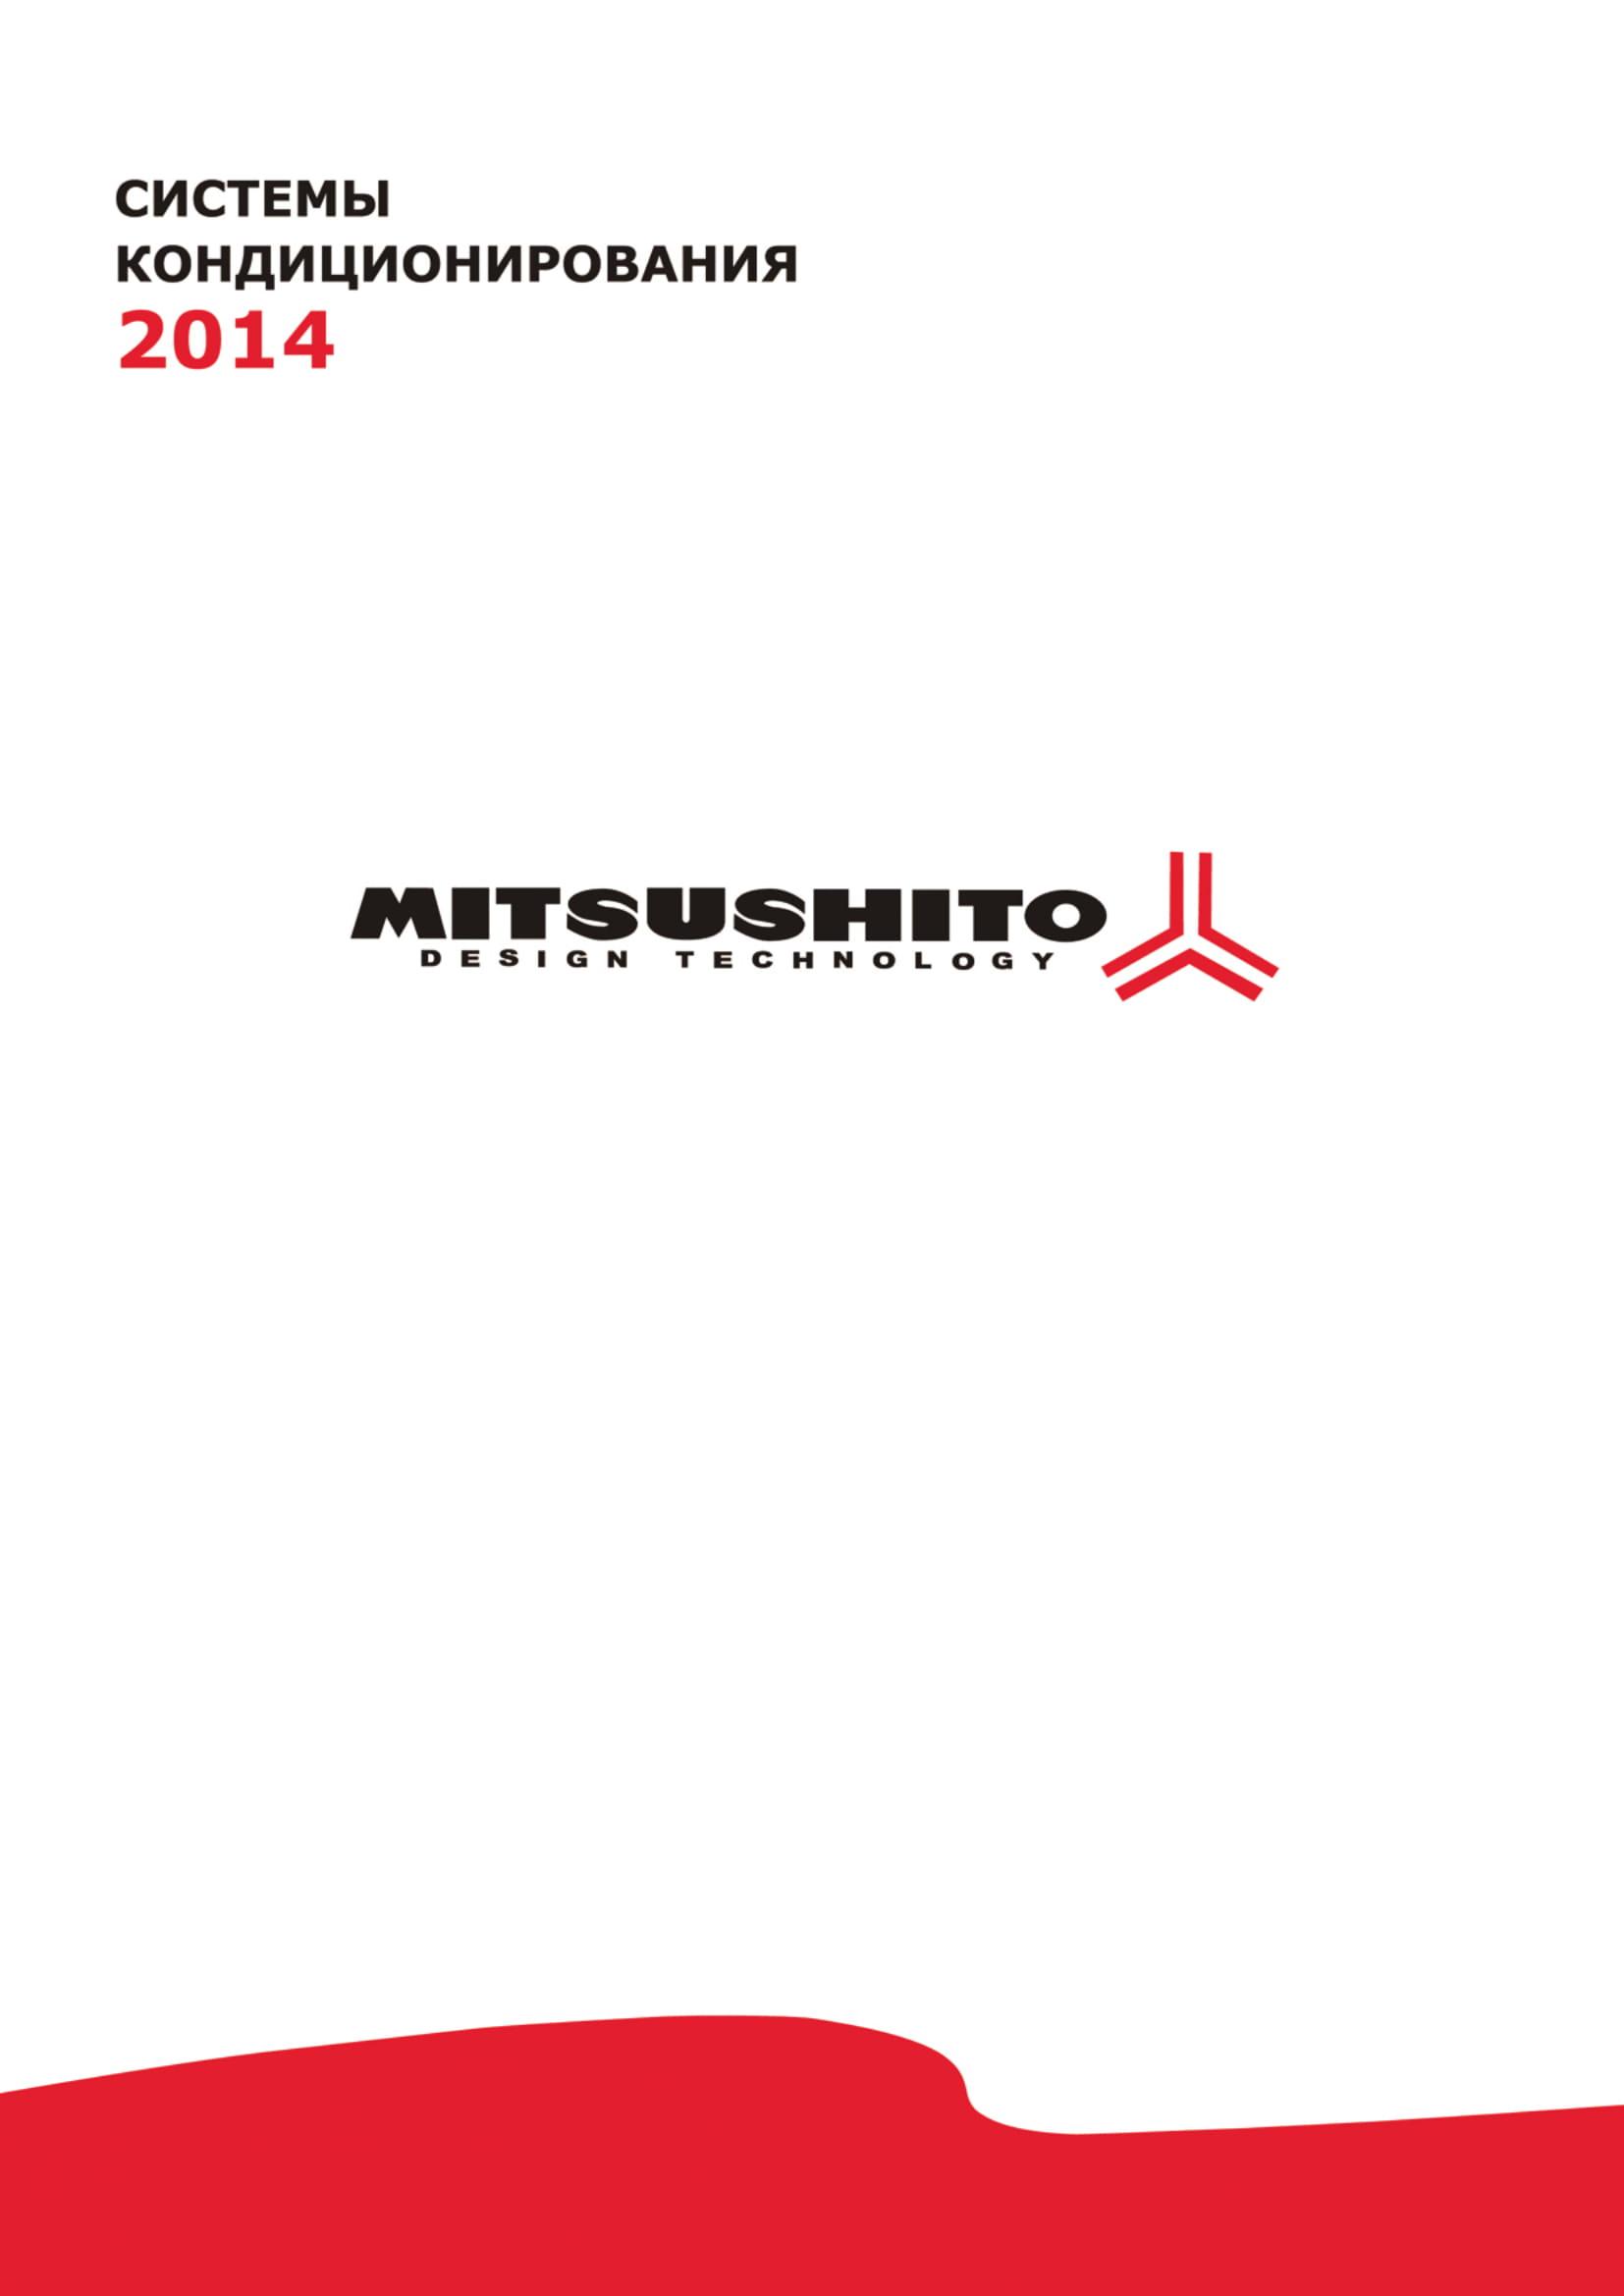 Mitsushito каталог 2014